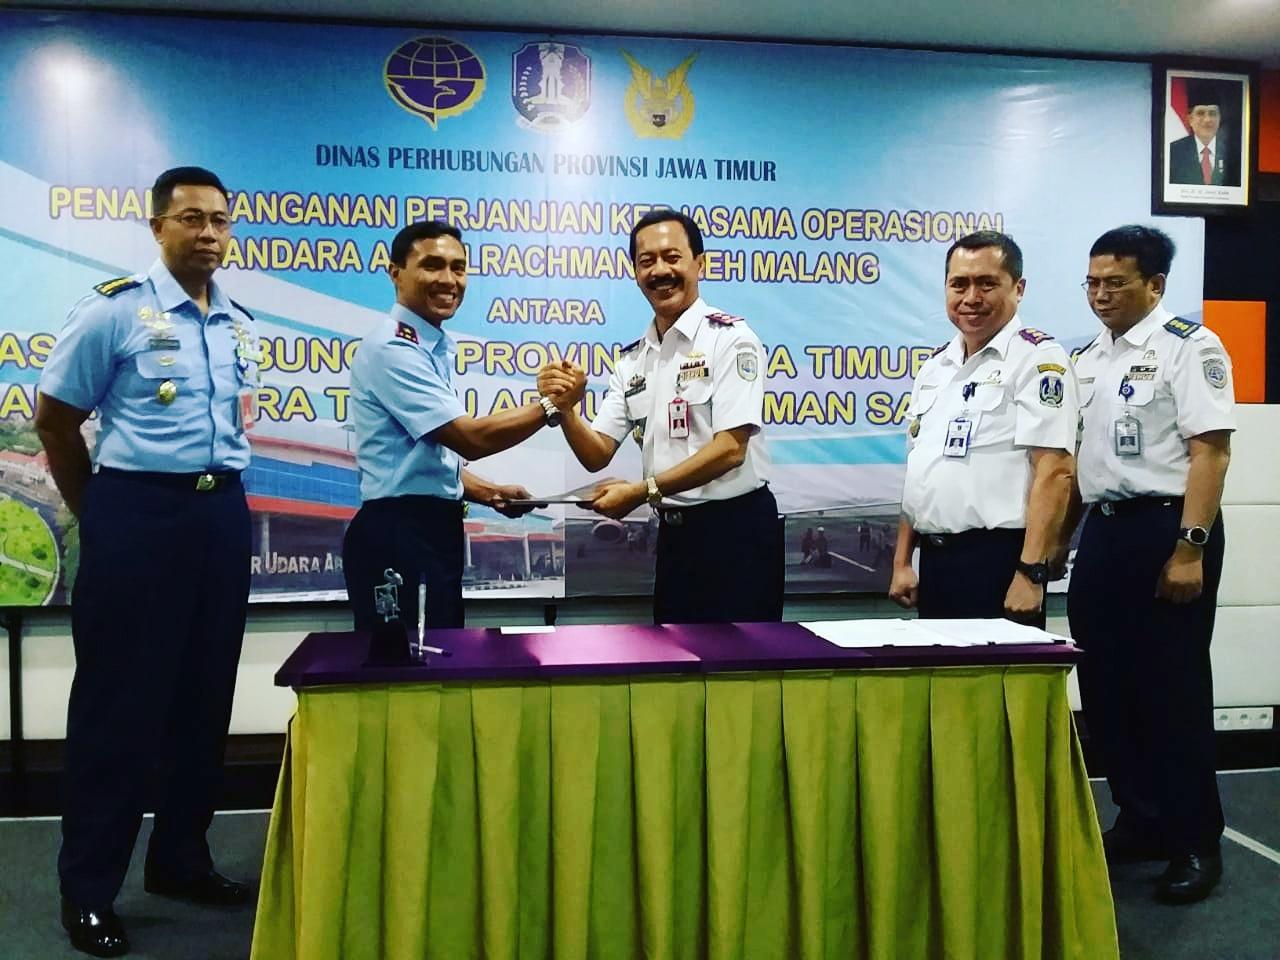 Perjanjian Kerjasama Operasional Bandara Abdulrachman Saleh Malang